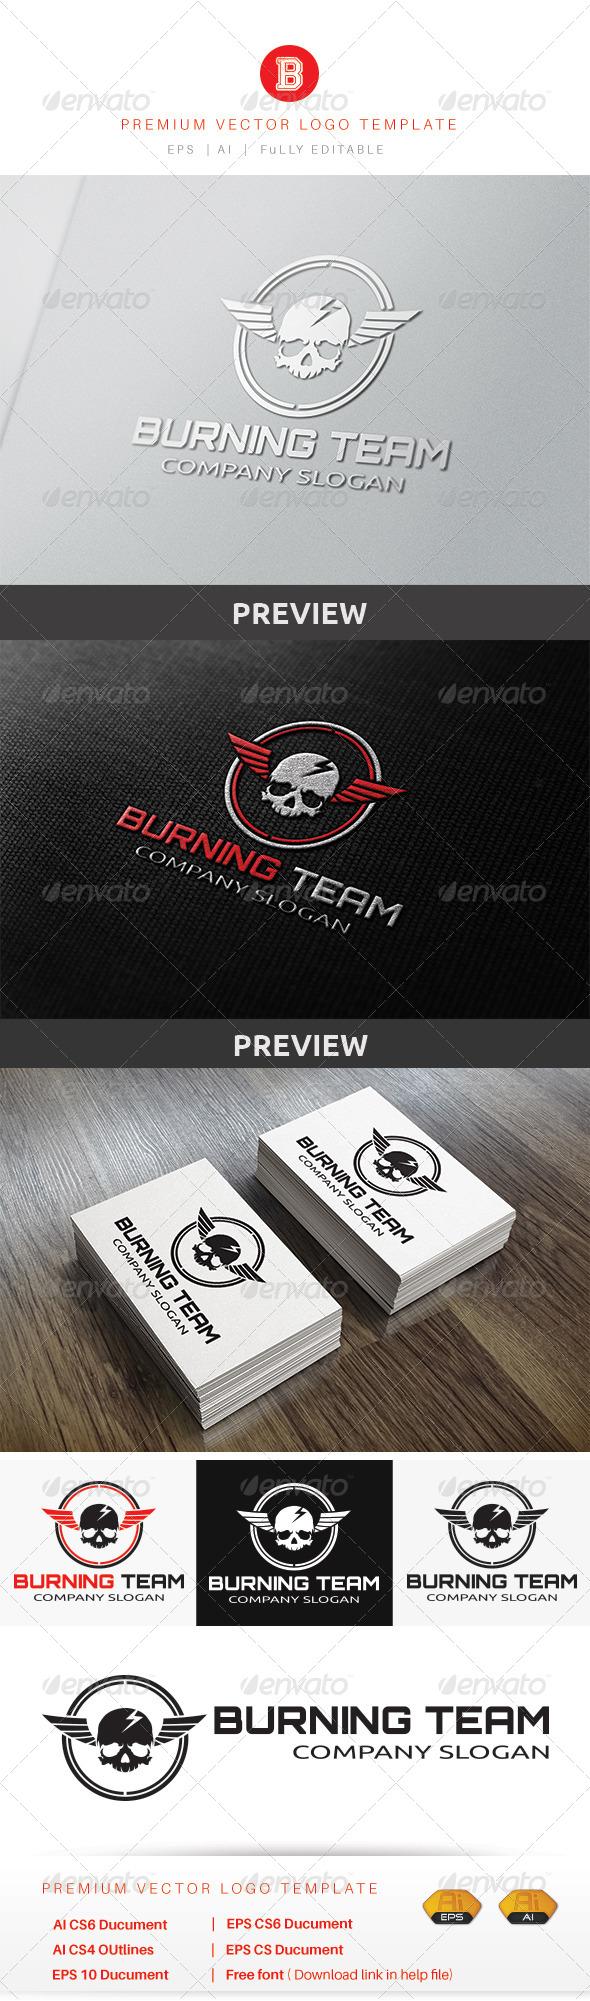 GraphicRiver Burning Team 8565598